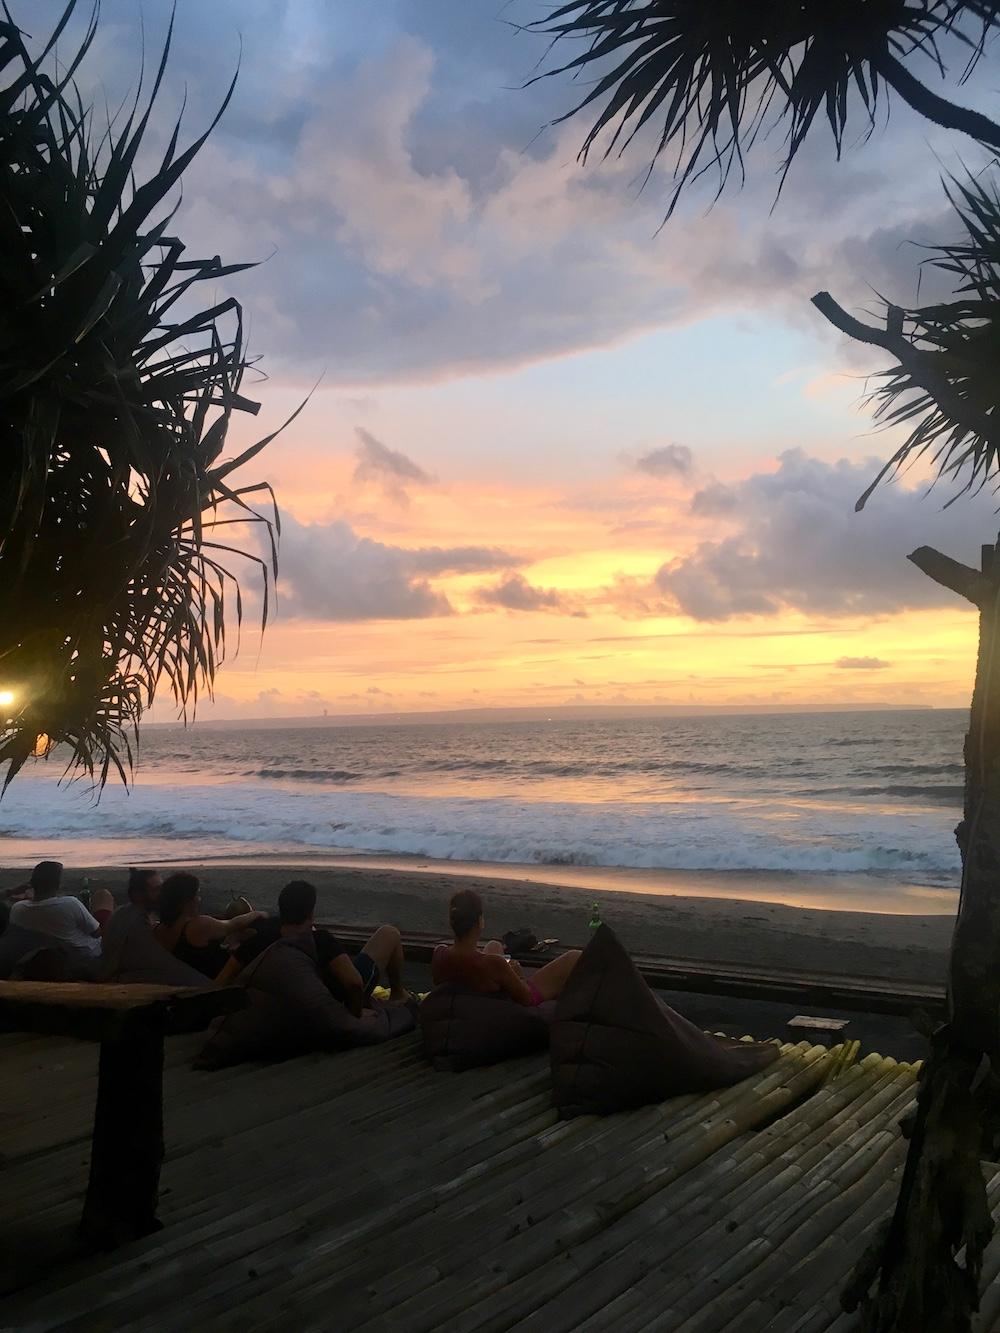 Sunset an abgerissener Sun Paradise Bar